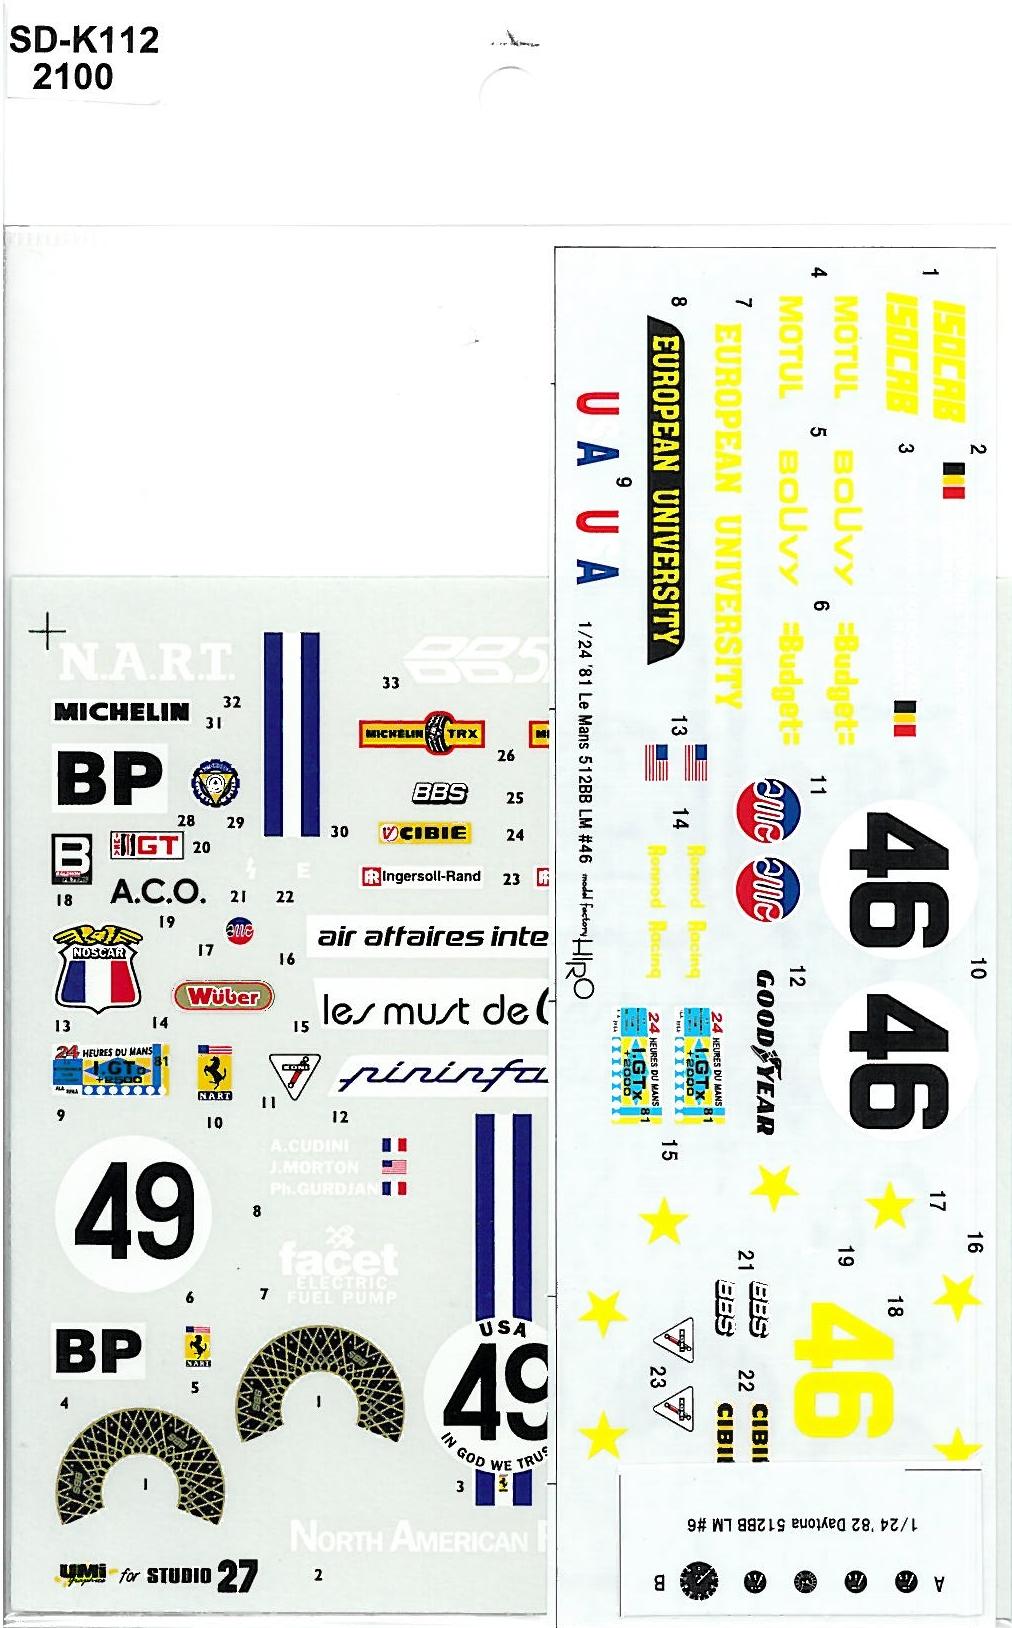 SDK-112 512BB LM NART#49 EU#46